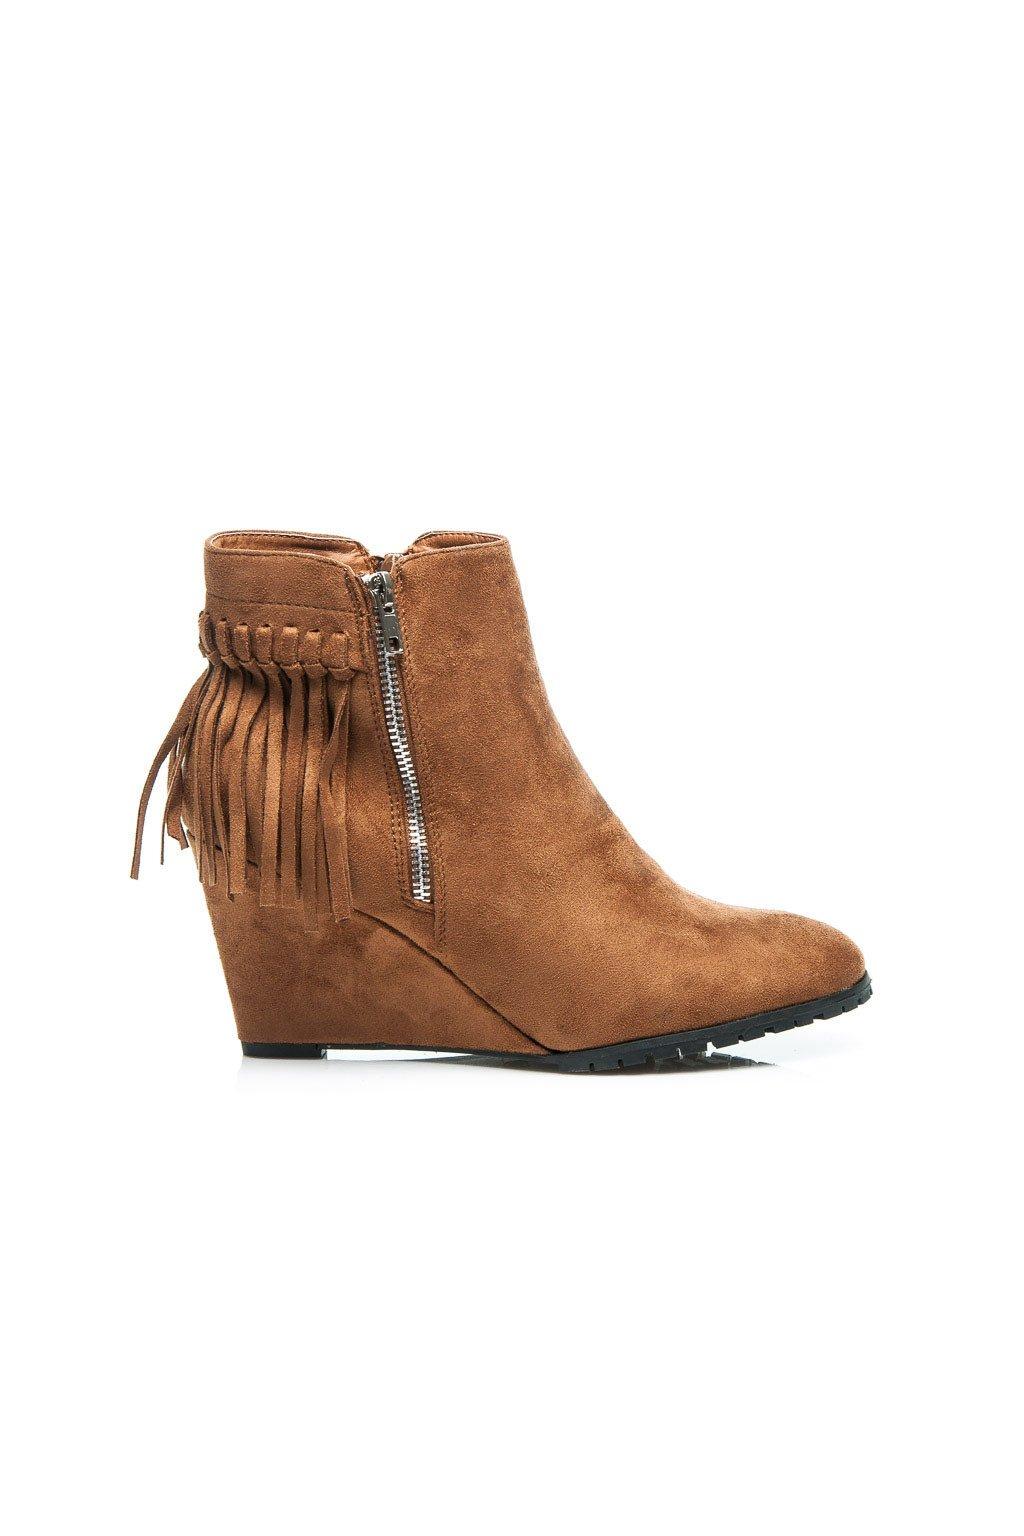 790d5bf66a40 Zimná obuv baťa